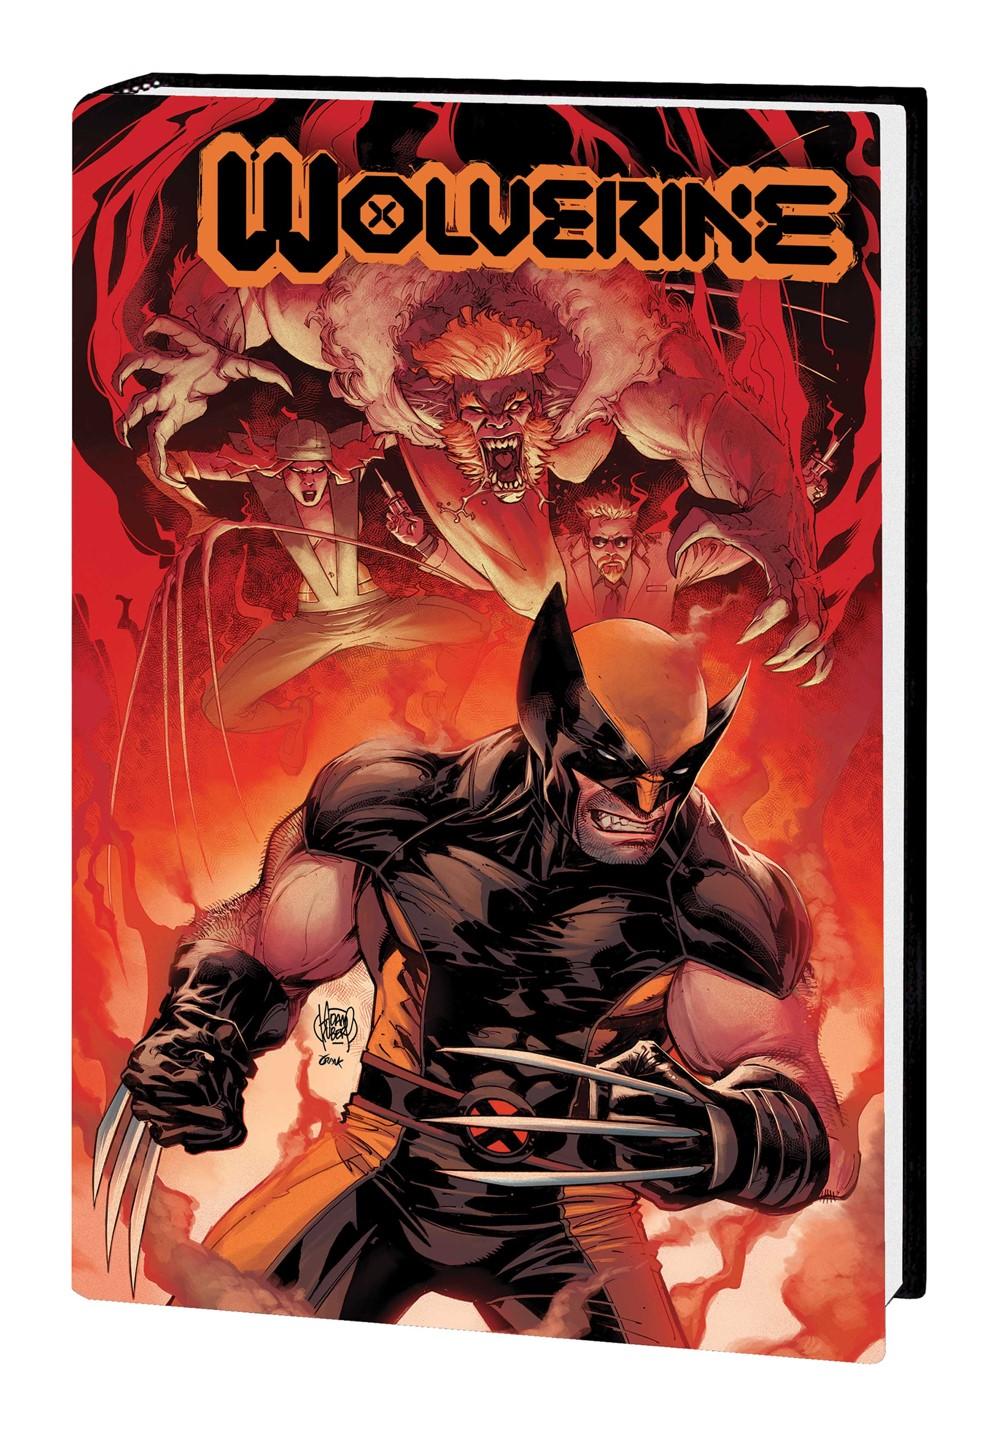 WOLVERINE_PERCY_VOL_1_HC Marvel Comics September 2021 Solicitations